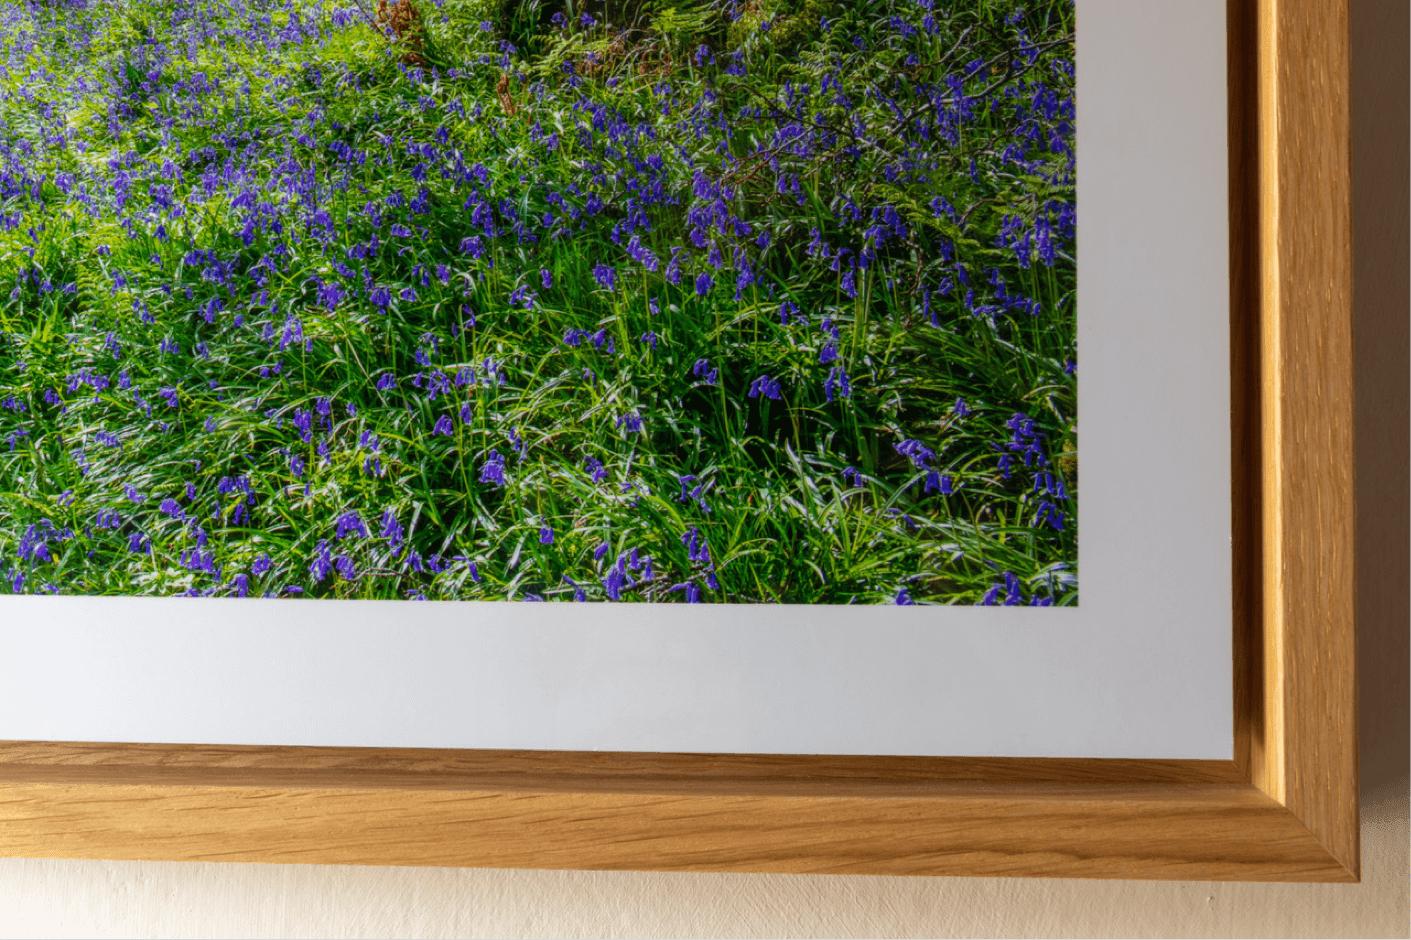 Classic framed, 450x300mm